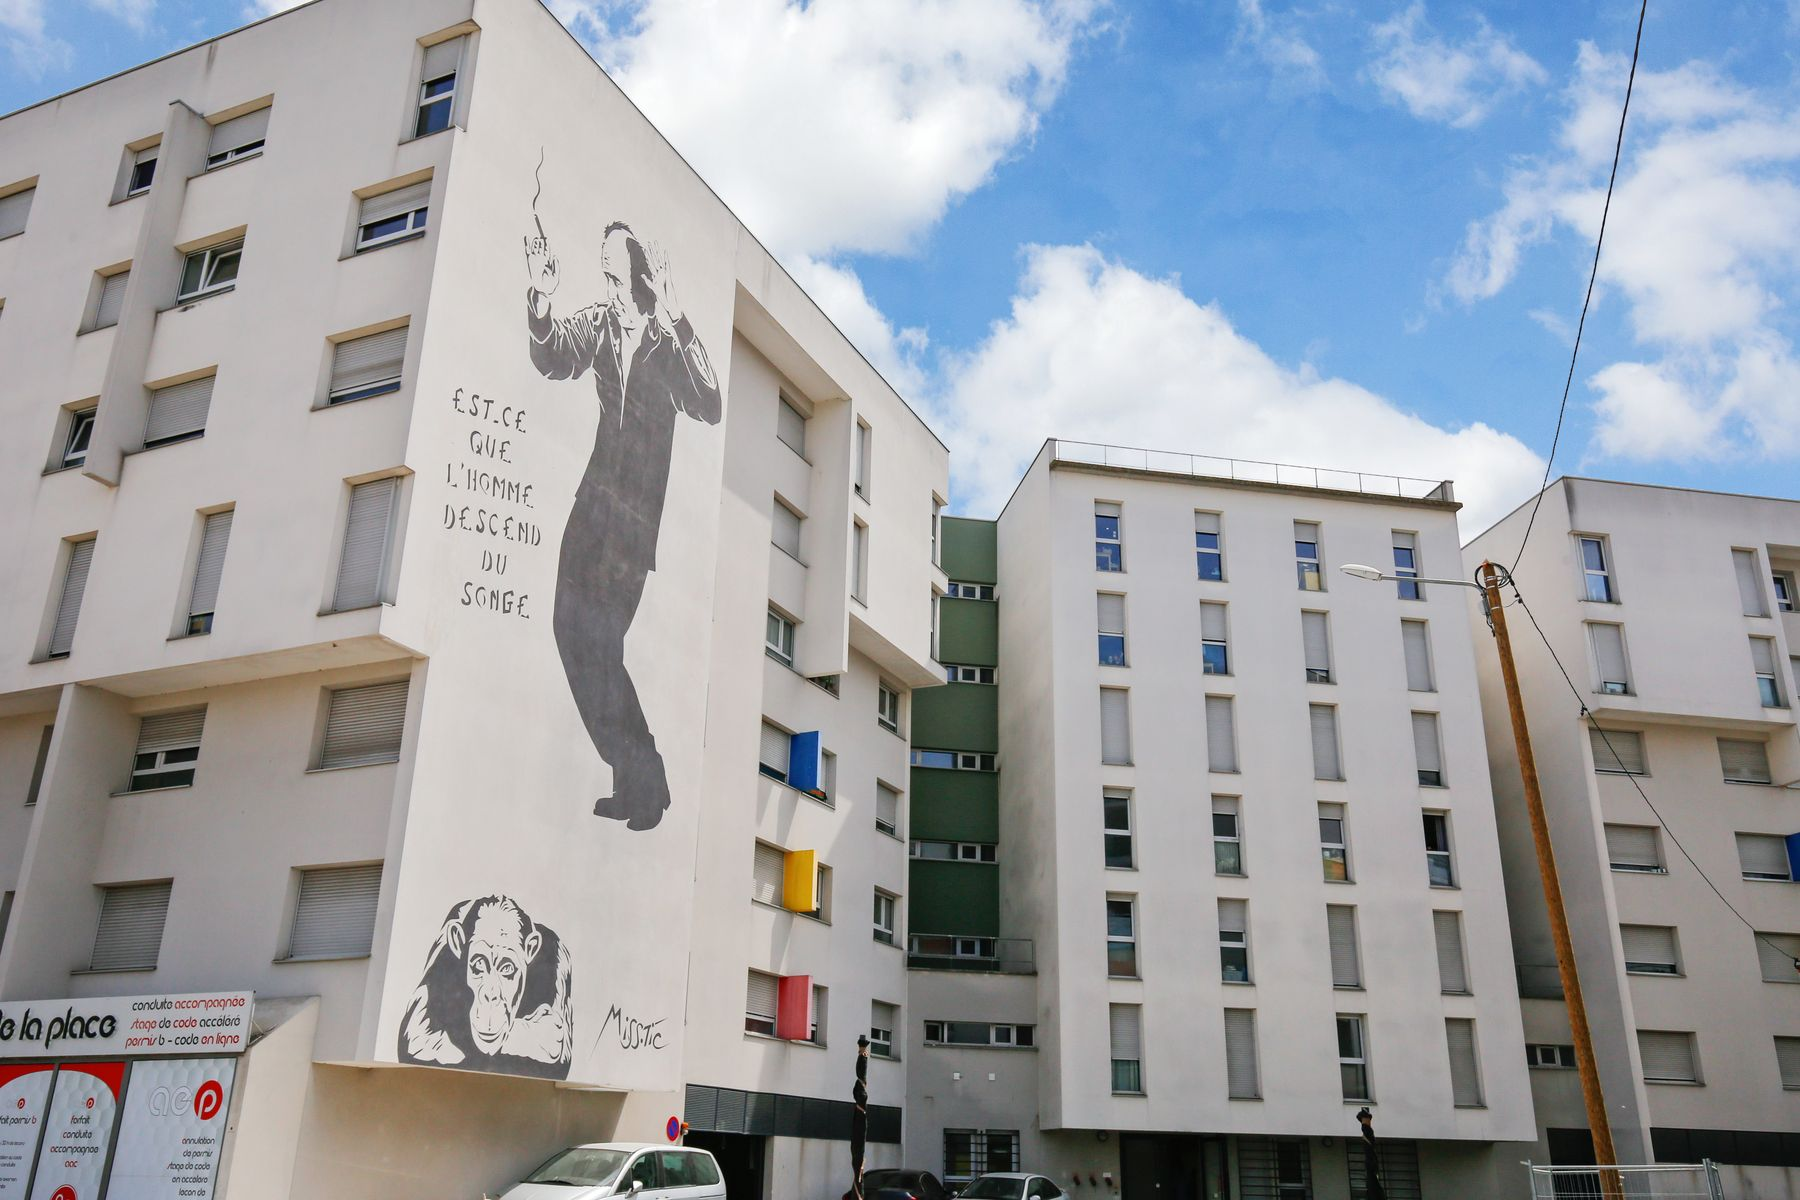 LOGIFAC résidence étudiante Léo Ferré Orly immeuble